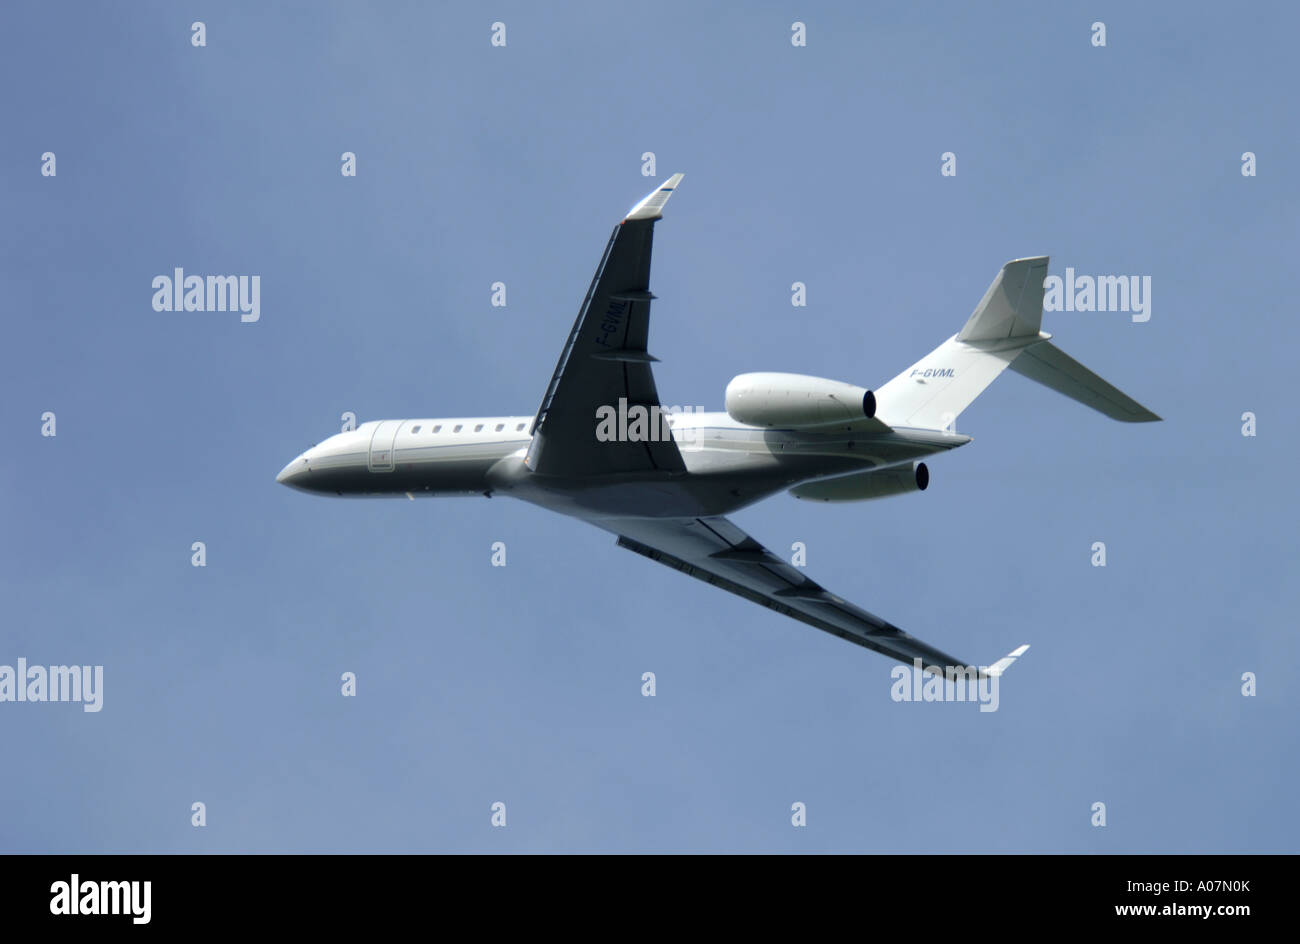 Dassault Falcon 900 super large Tri Jet departing Inverness Dalcross Airport.  XAV 3990-380 - Stock Image